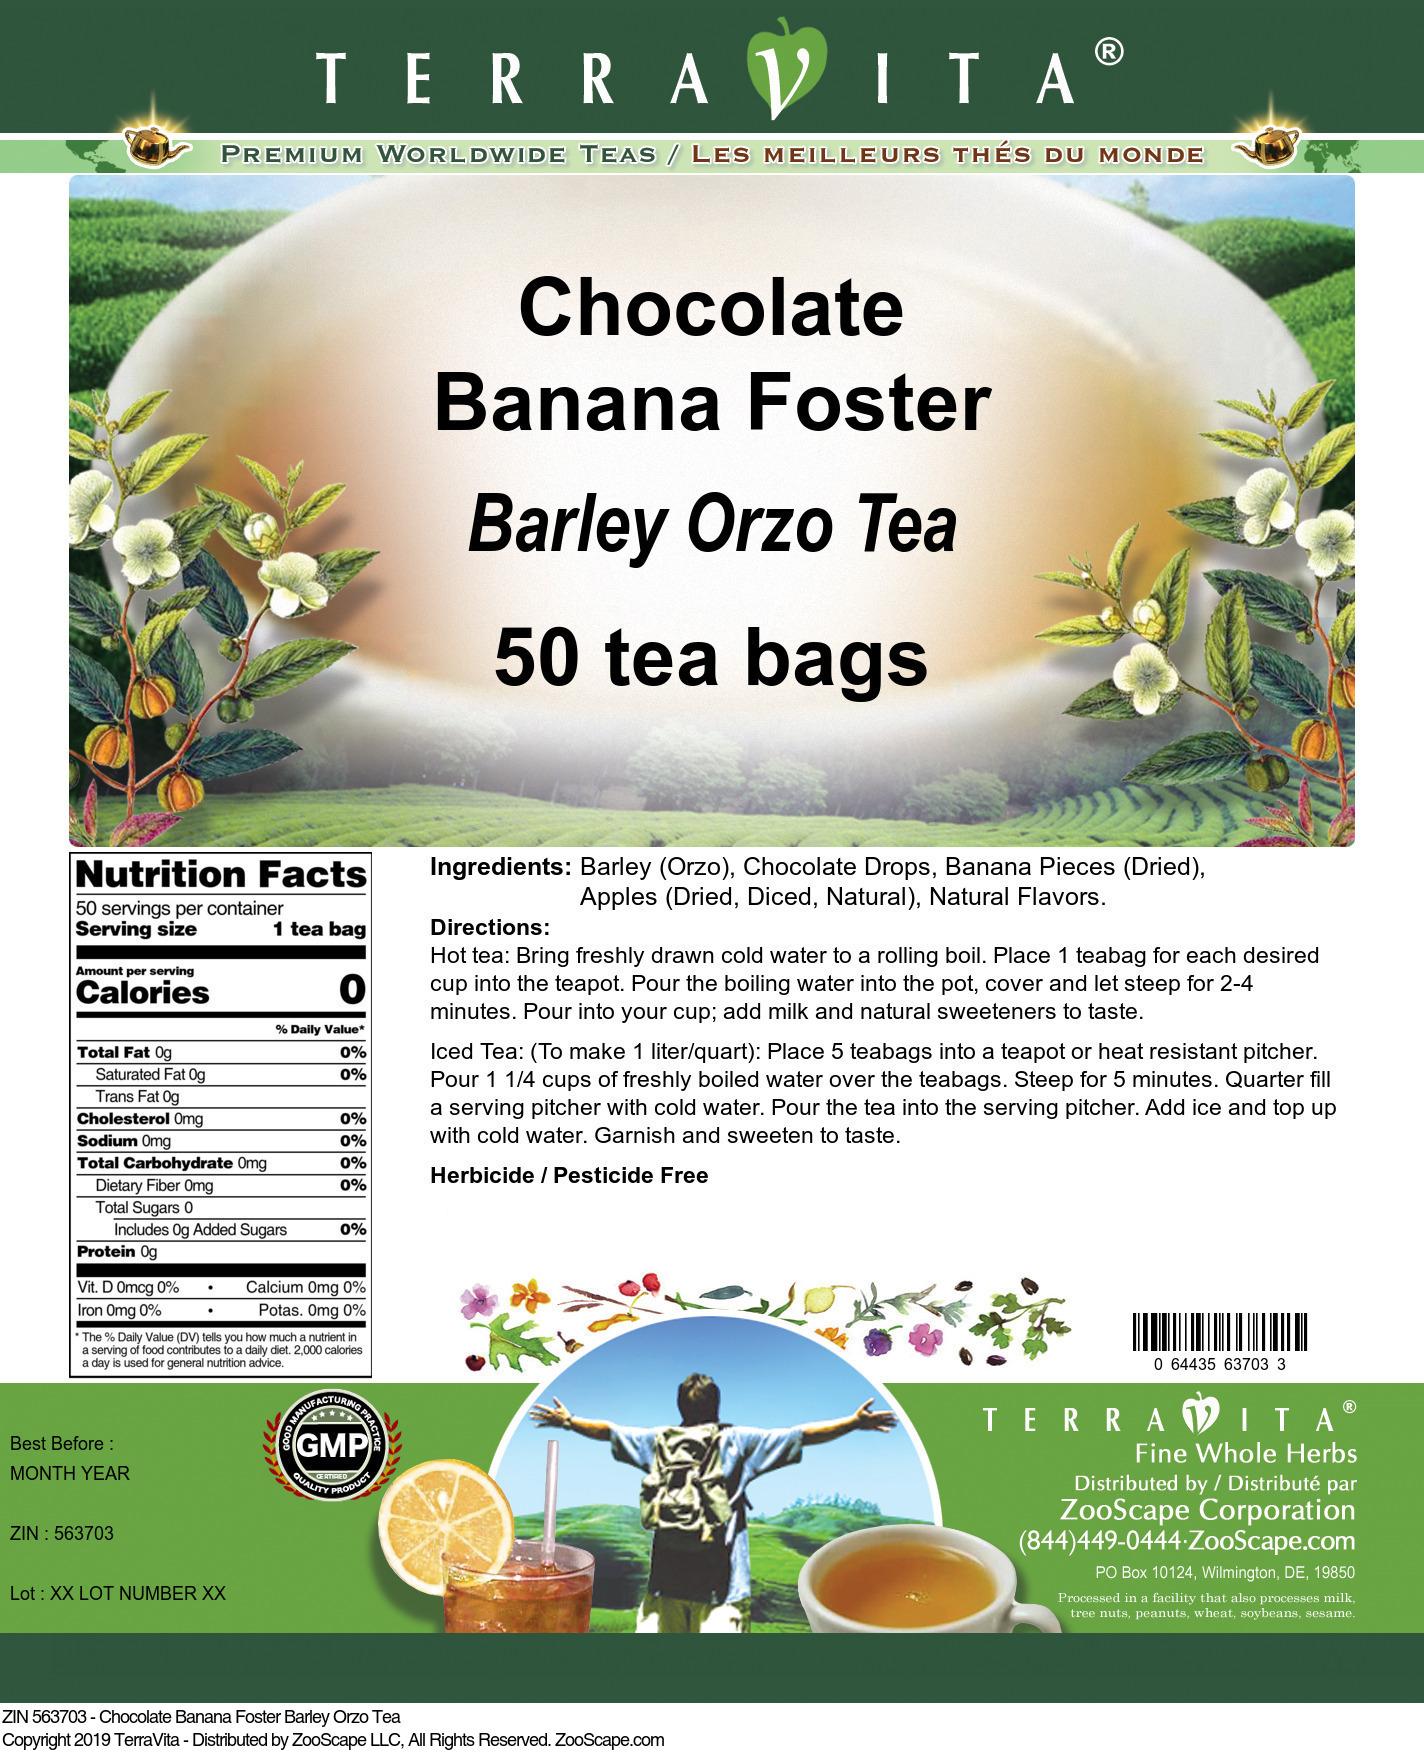 Chocolate Banana Foster Barley Orzo Tea